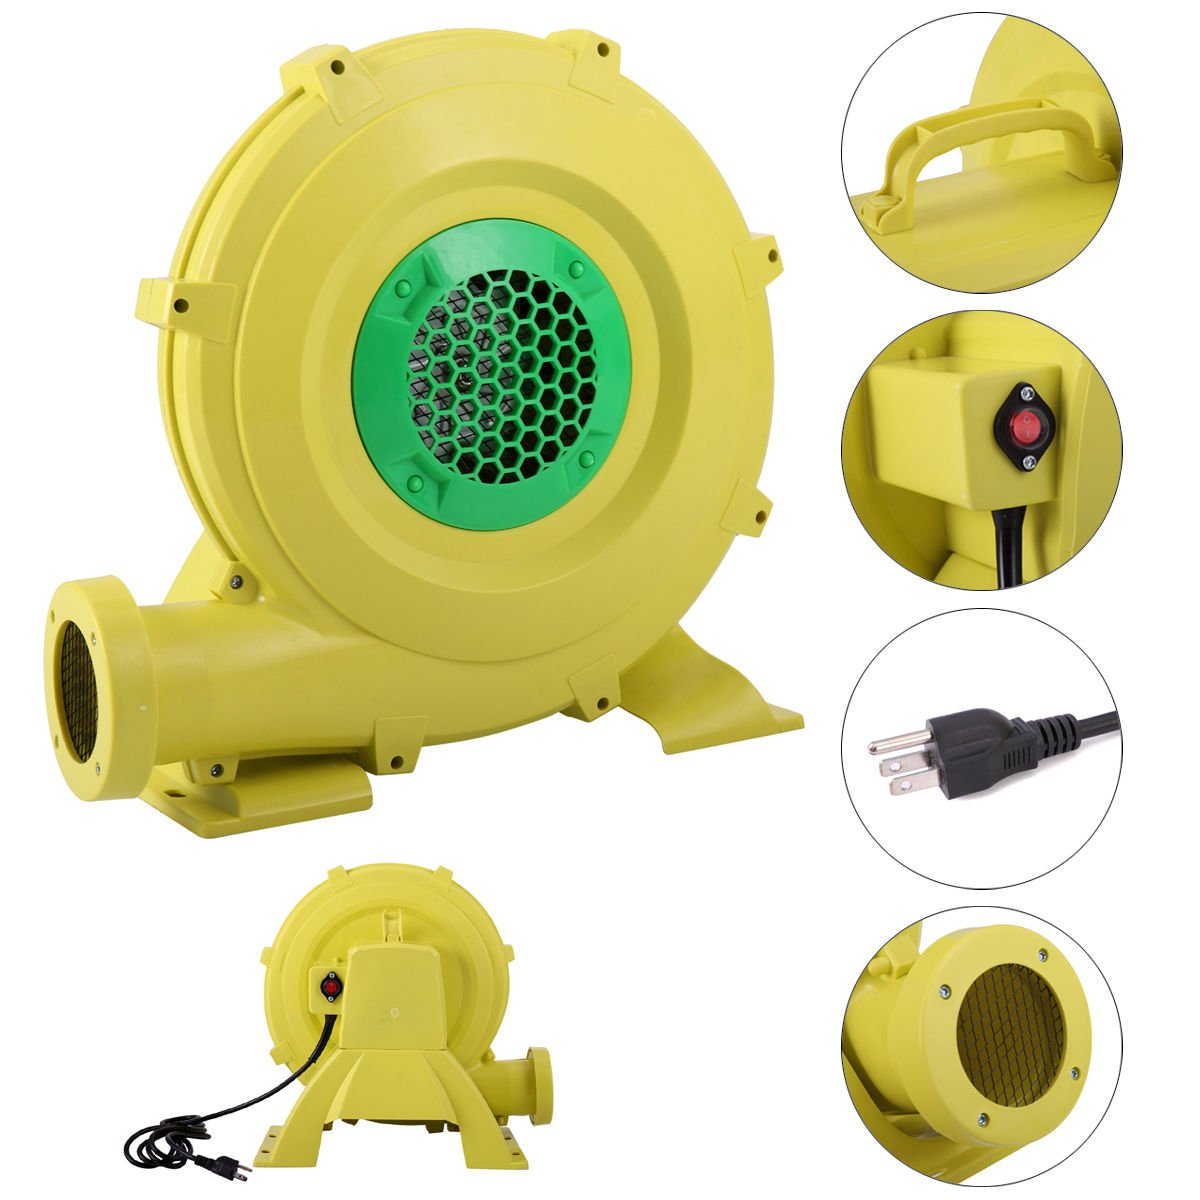 450 Watt Air Blower Pump Fan 0.6HP for Inflatable Bounce House Bouncy Castle